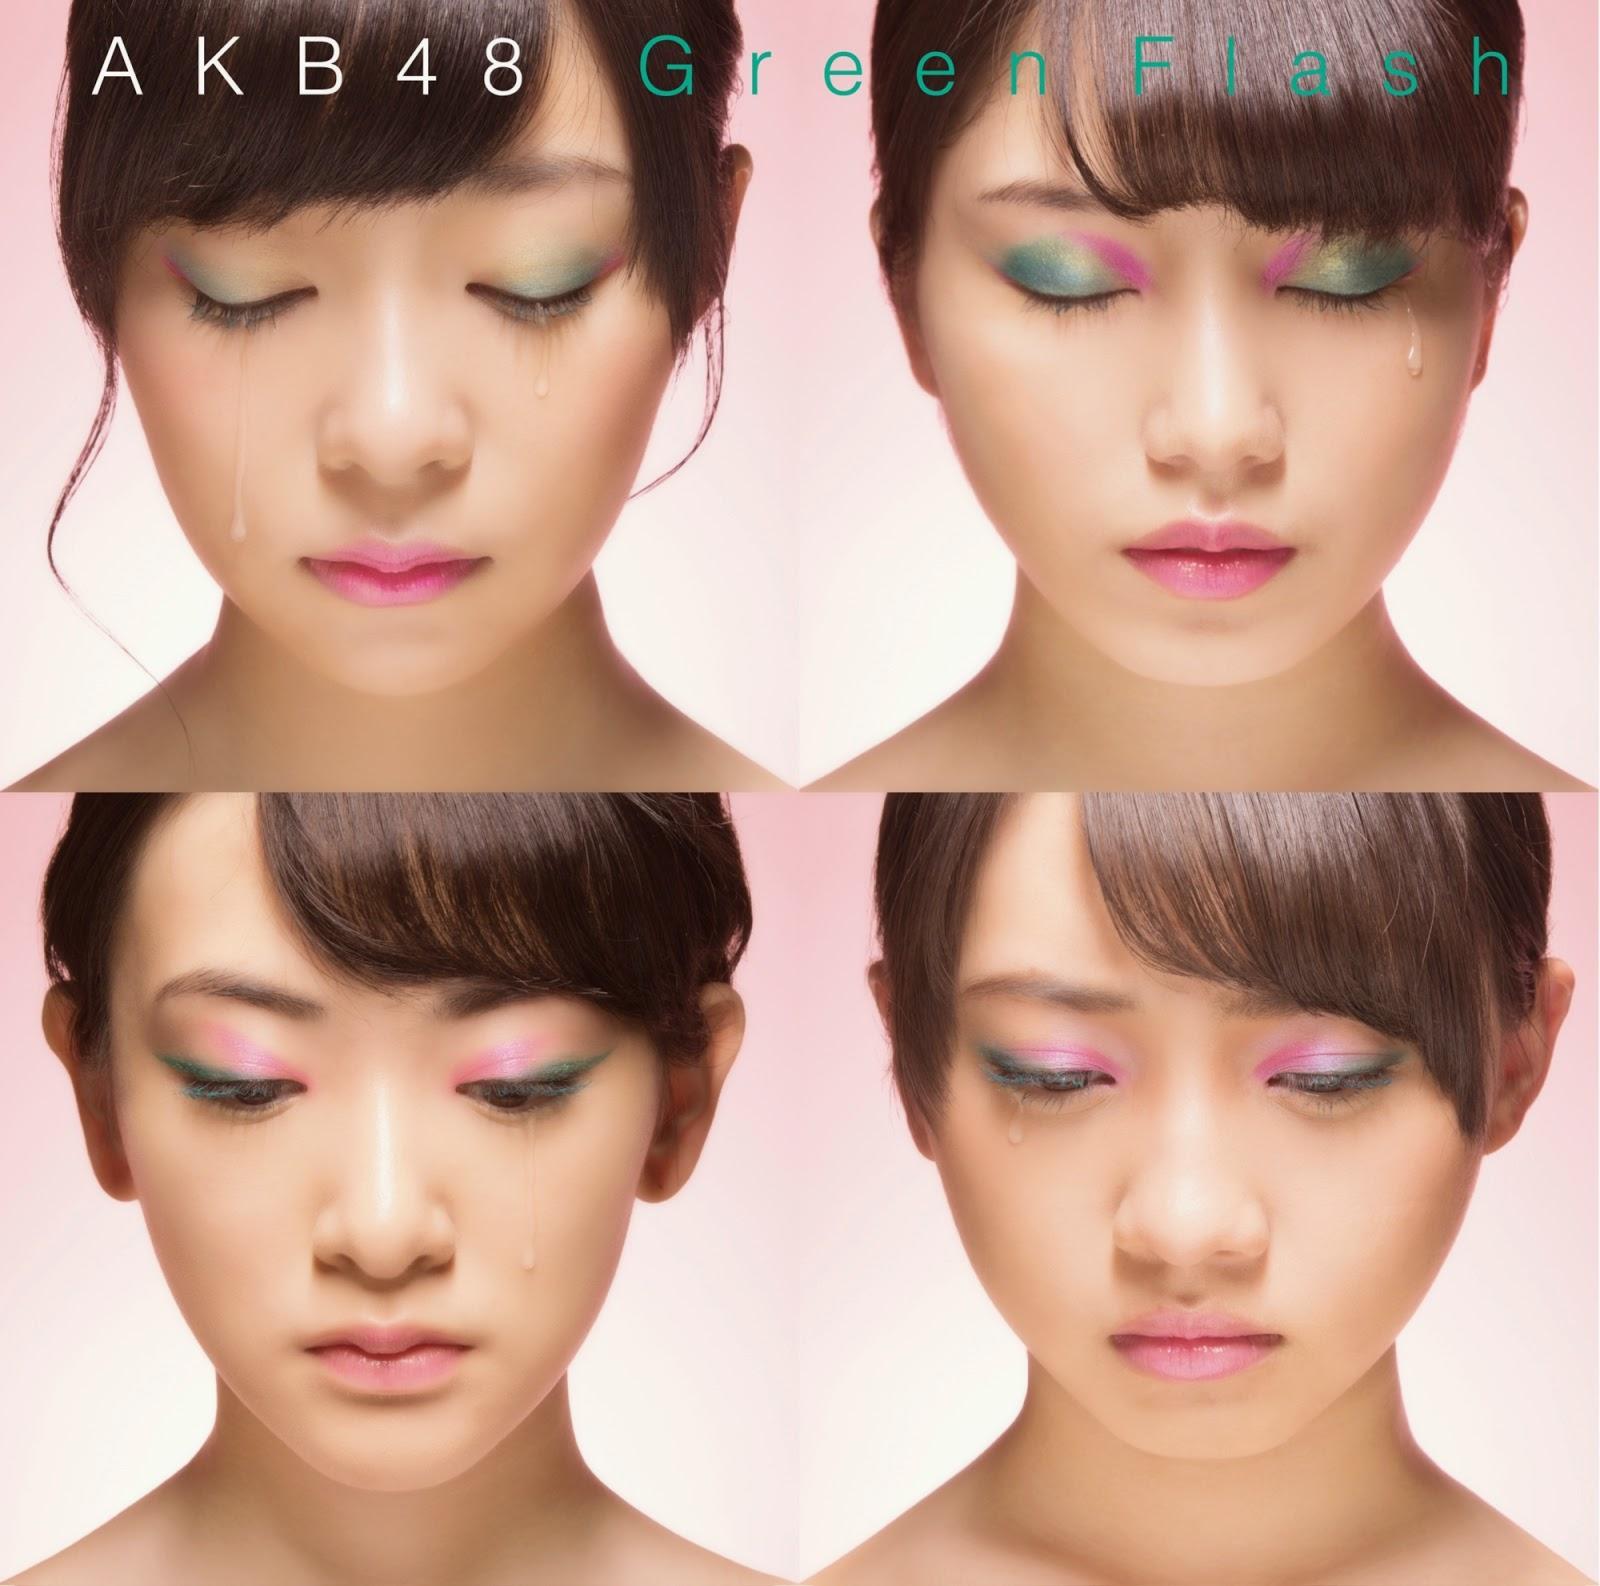 AKB48 履物と傘の物語 歌詞 Hakimono To Kasa No Monogatari lyrics